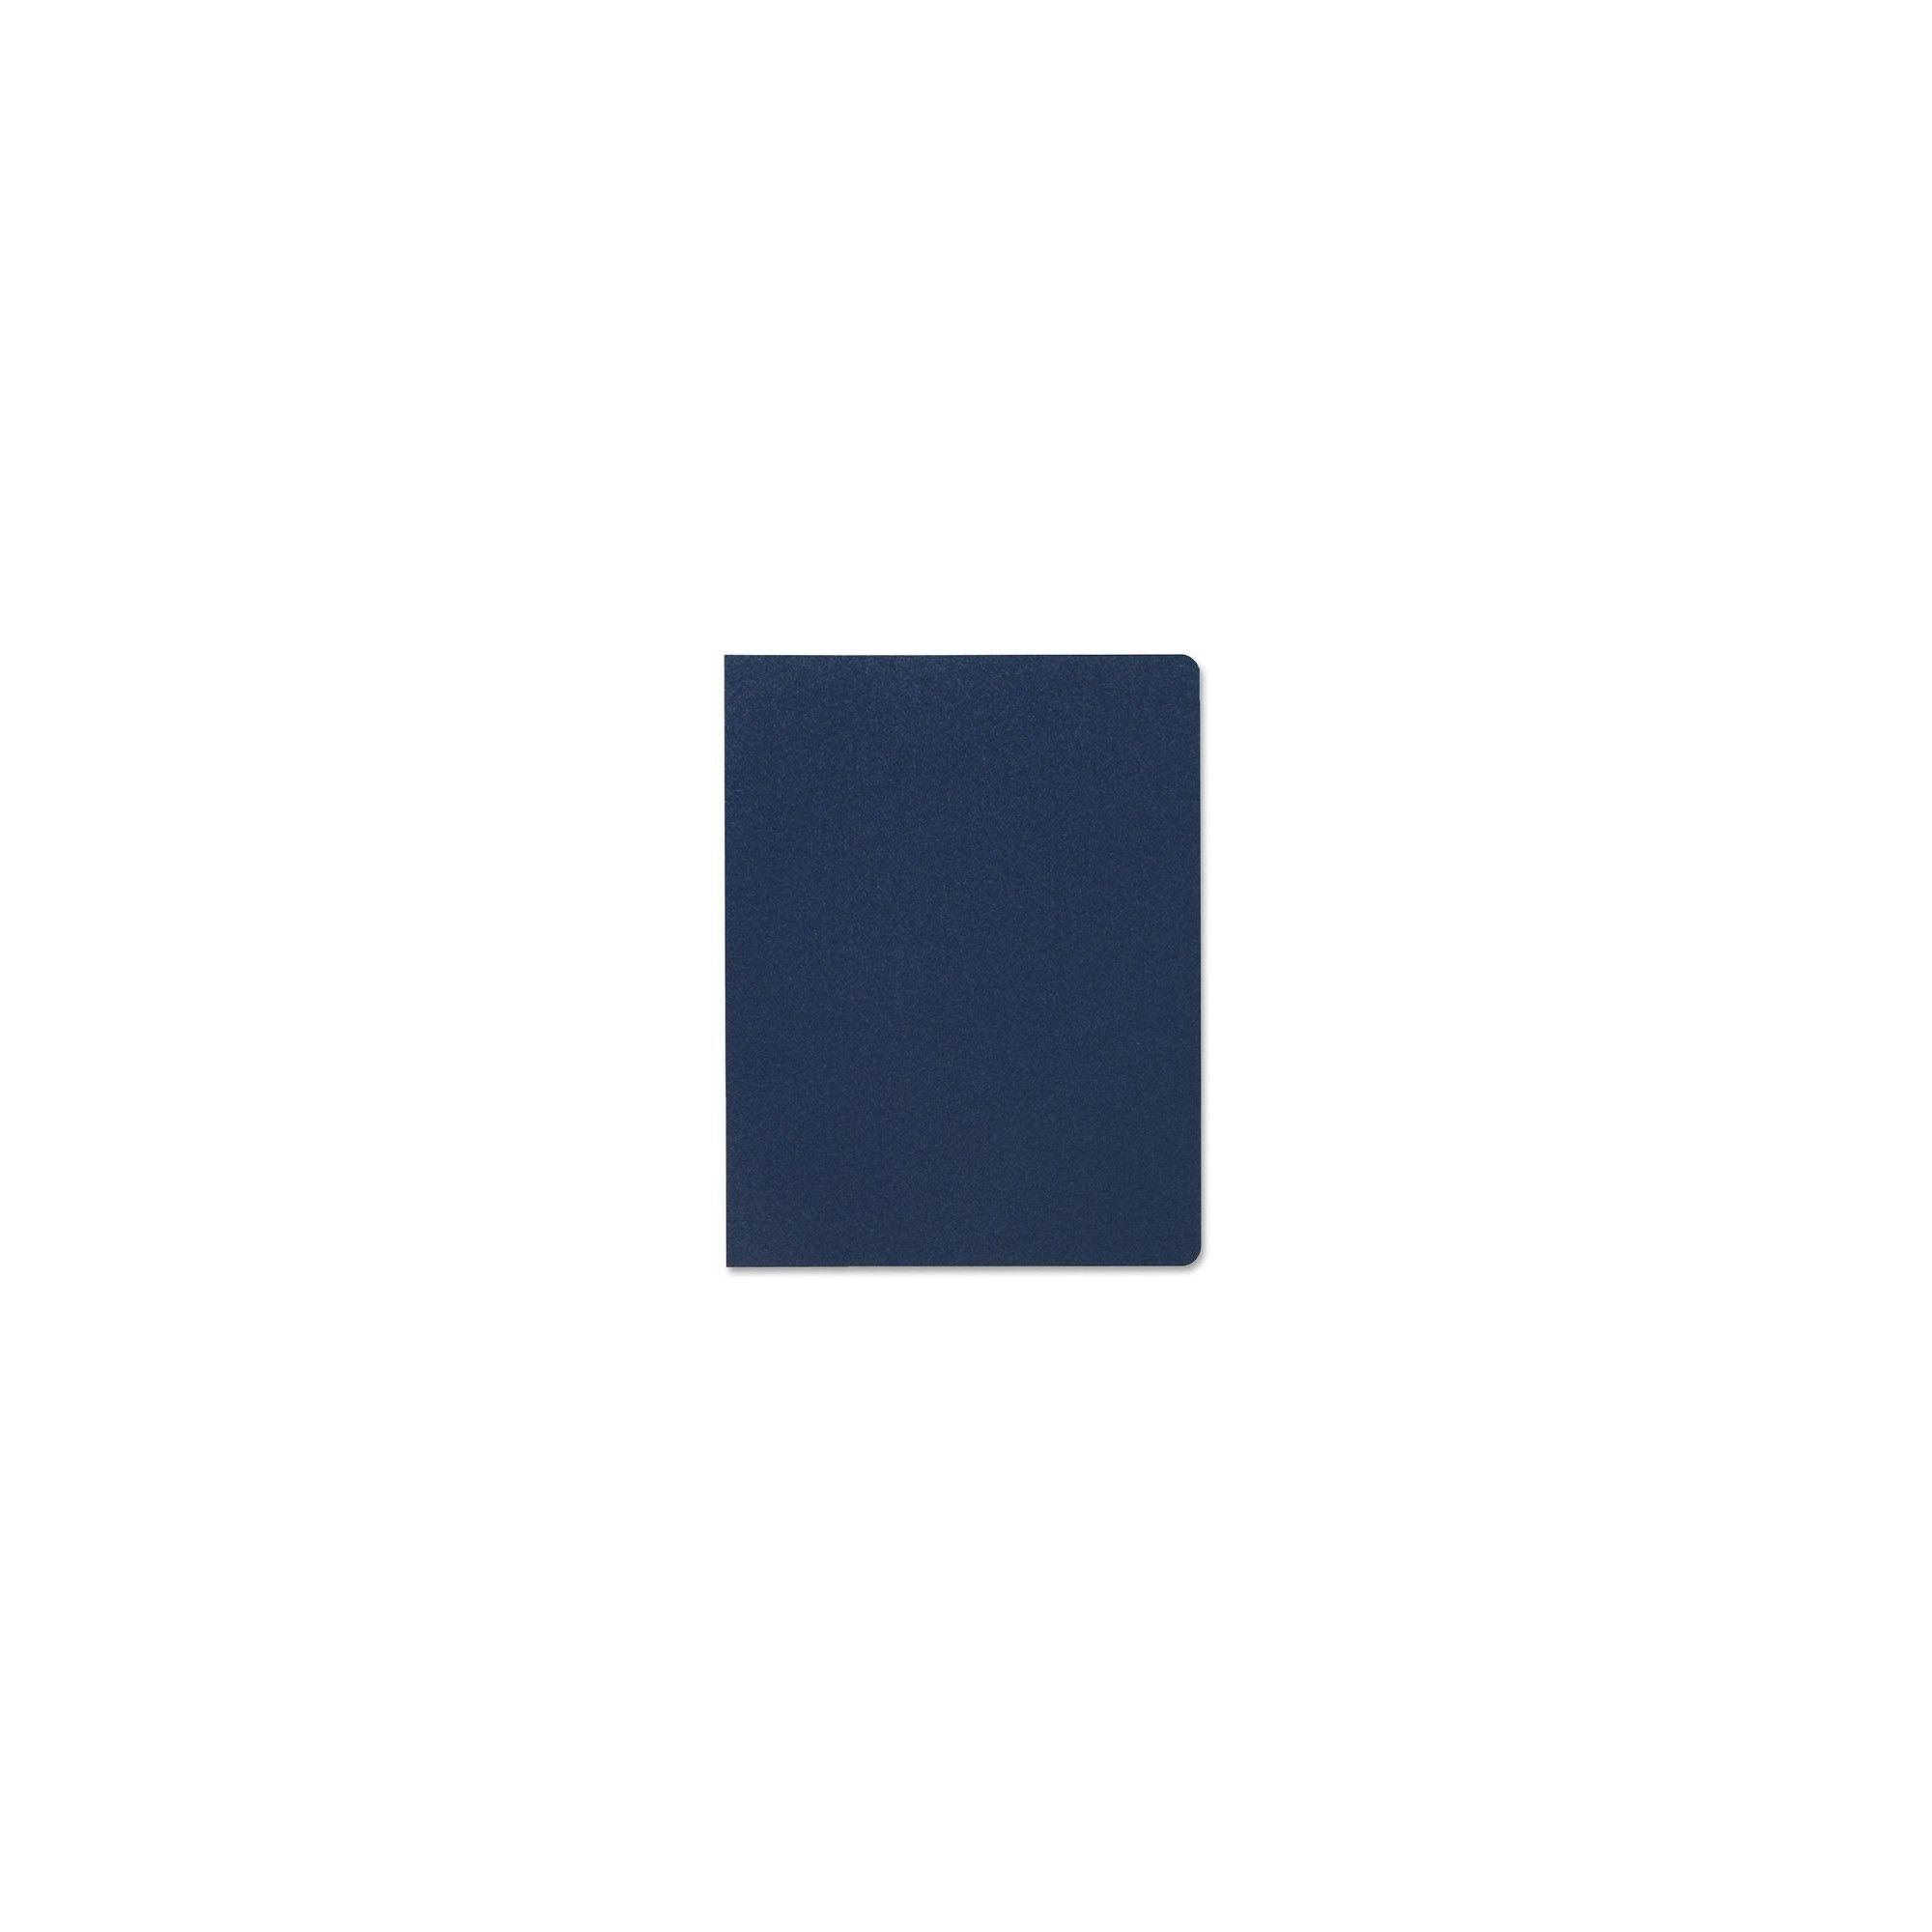 Swingline Gbc Solids Standard Covers Letter 8 3 4 X 11 1 4 Sheet Size Plastic Navy 25 Pack Blue Sheet Sizes